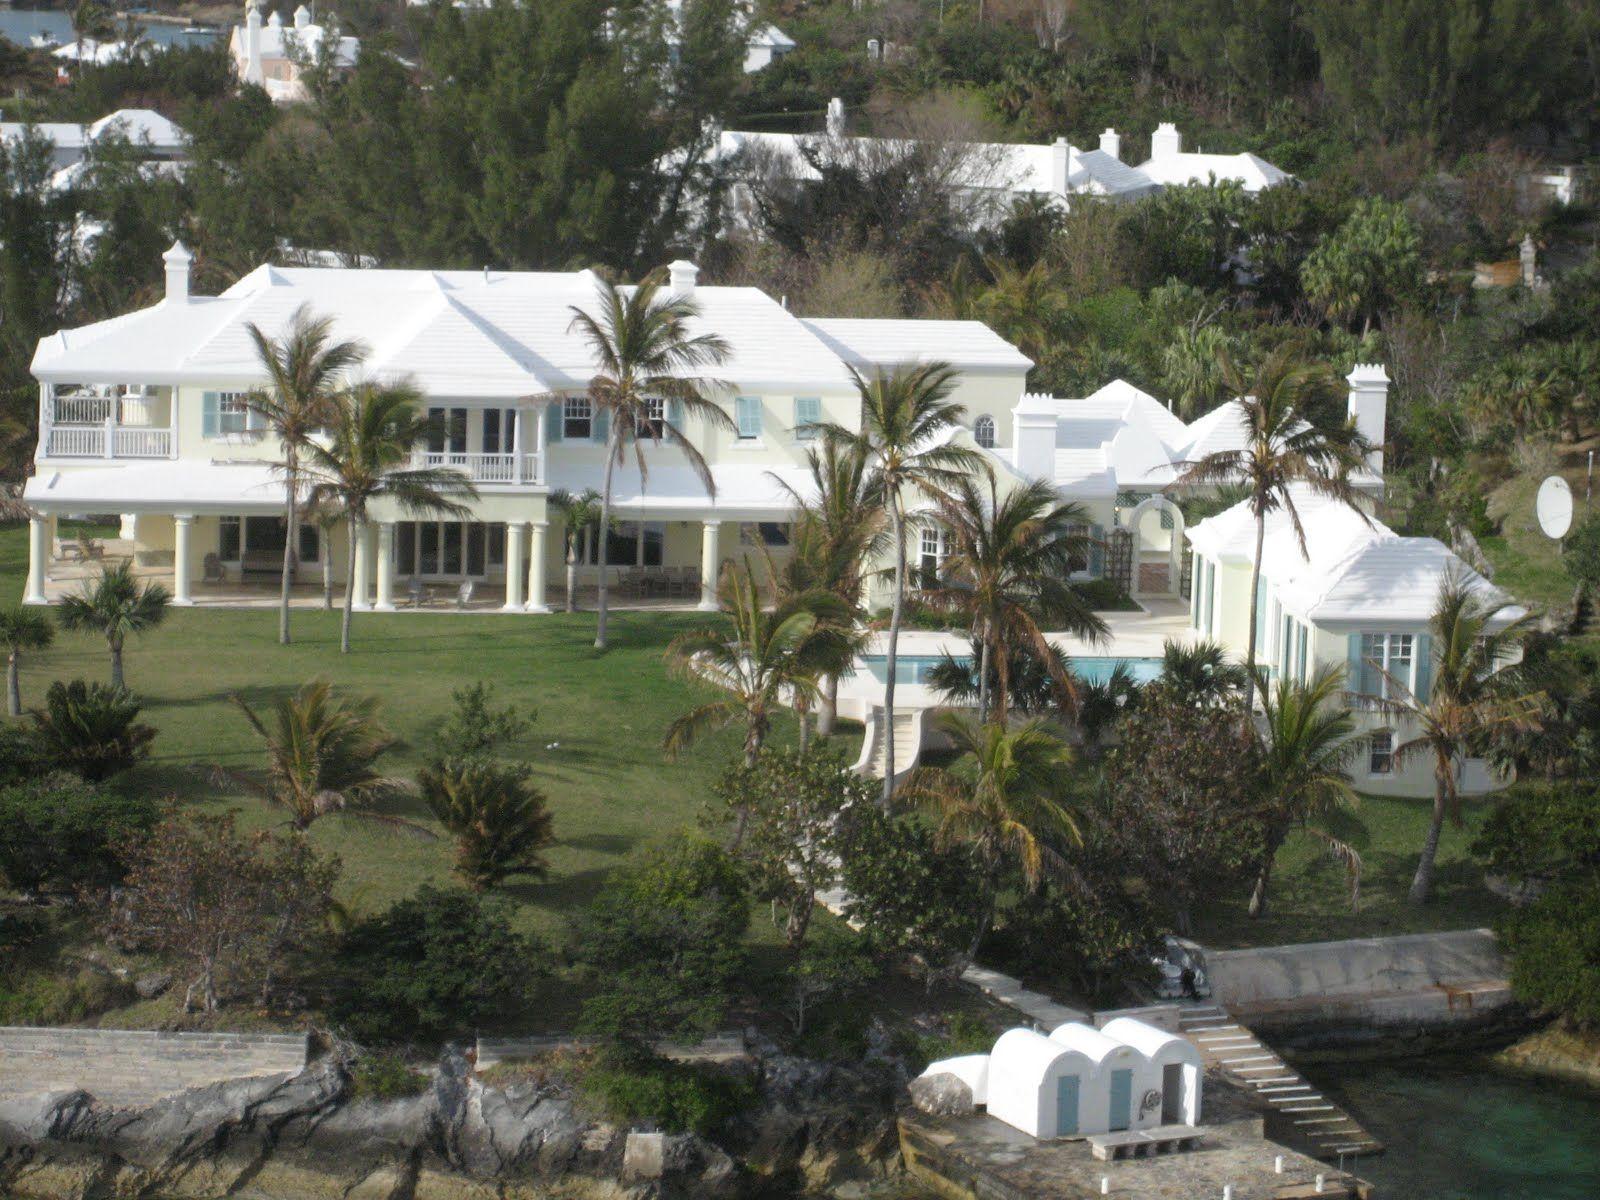 Bermuda Cruise By The Famous Homes Of Bermuda — Bermuda ...